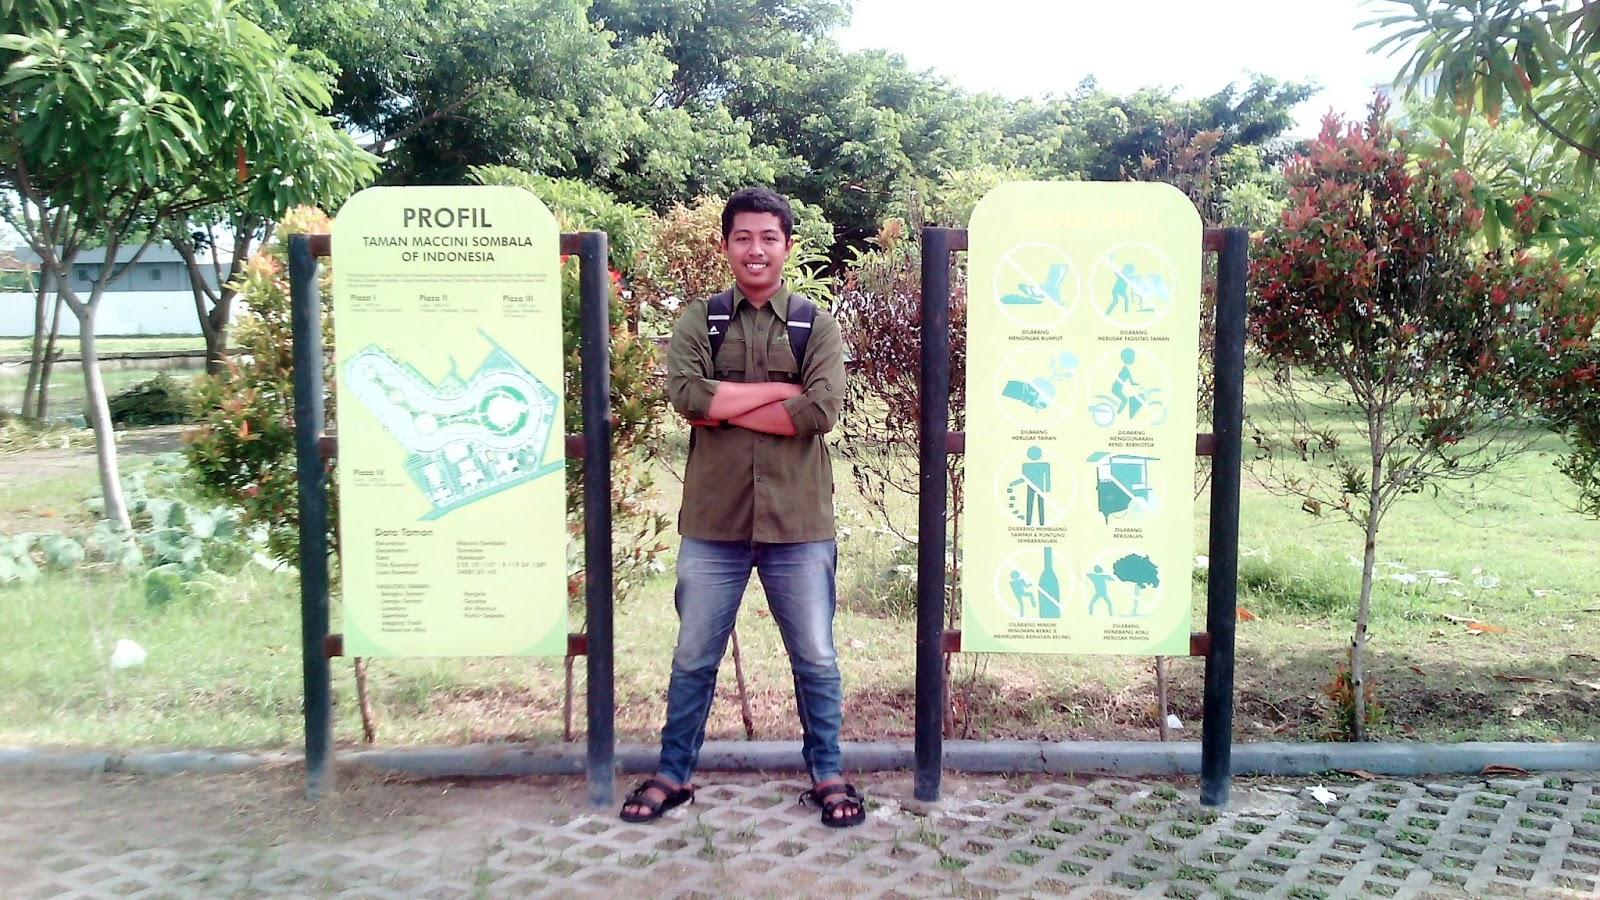 Wisata Taman Maccini Sombala Indonesia Makassar Aneka Kota